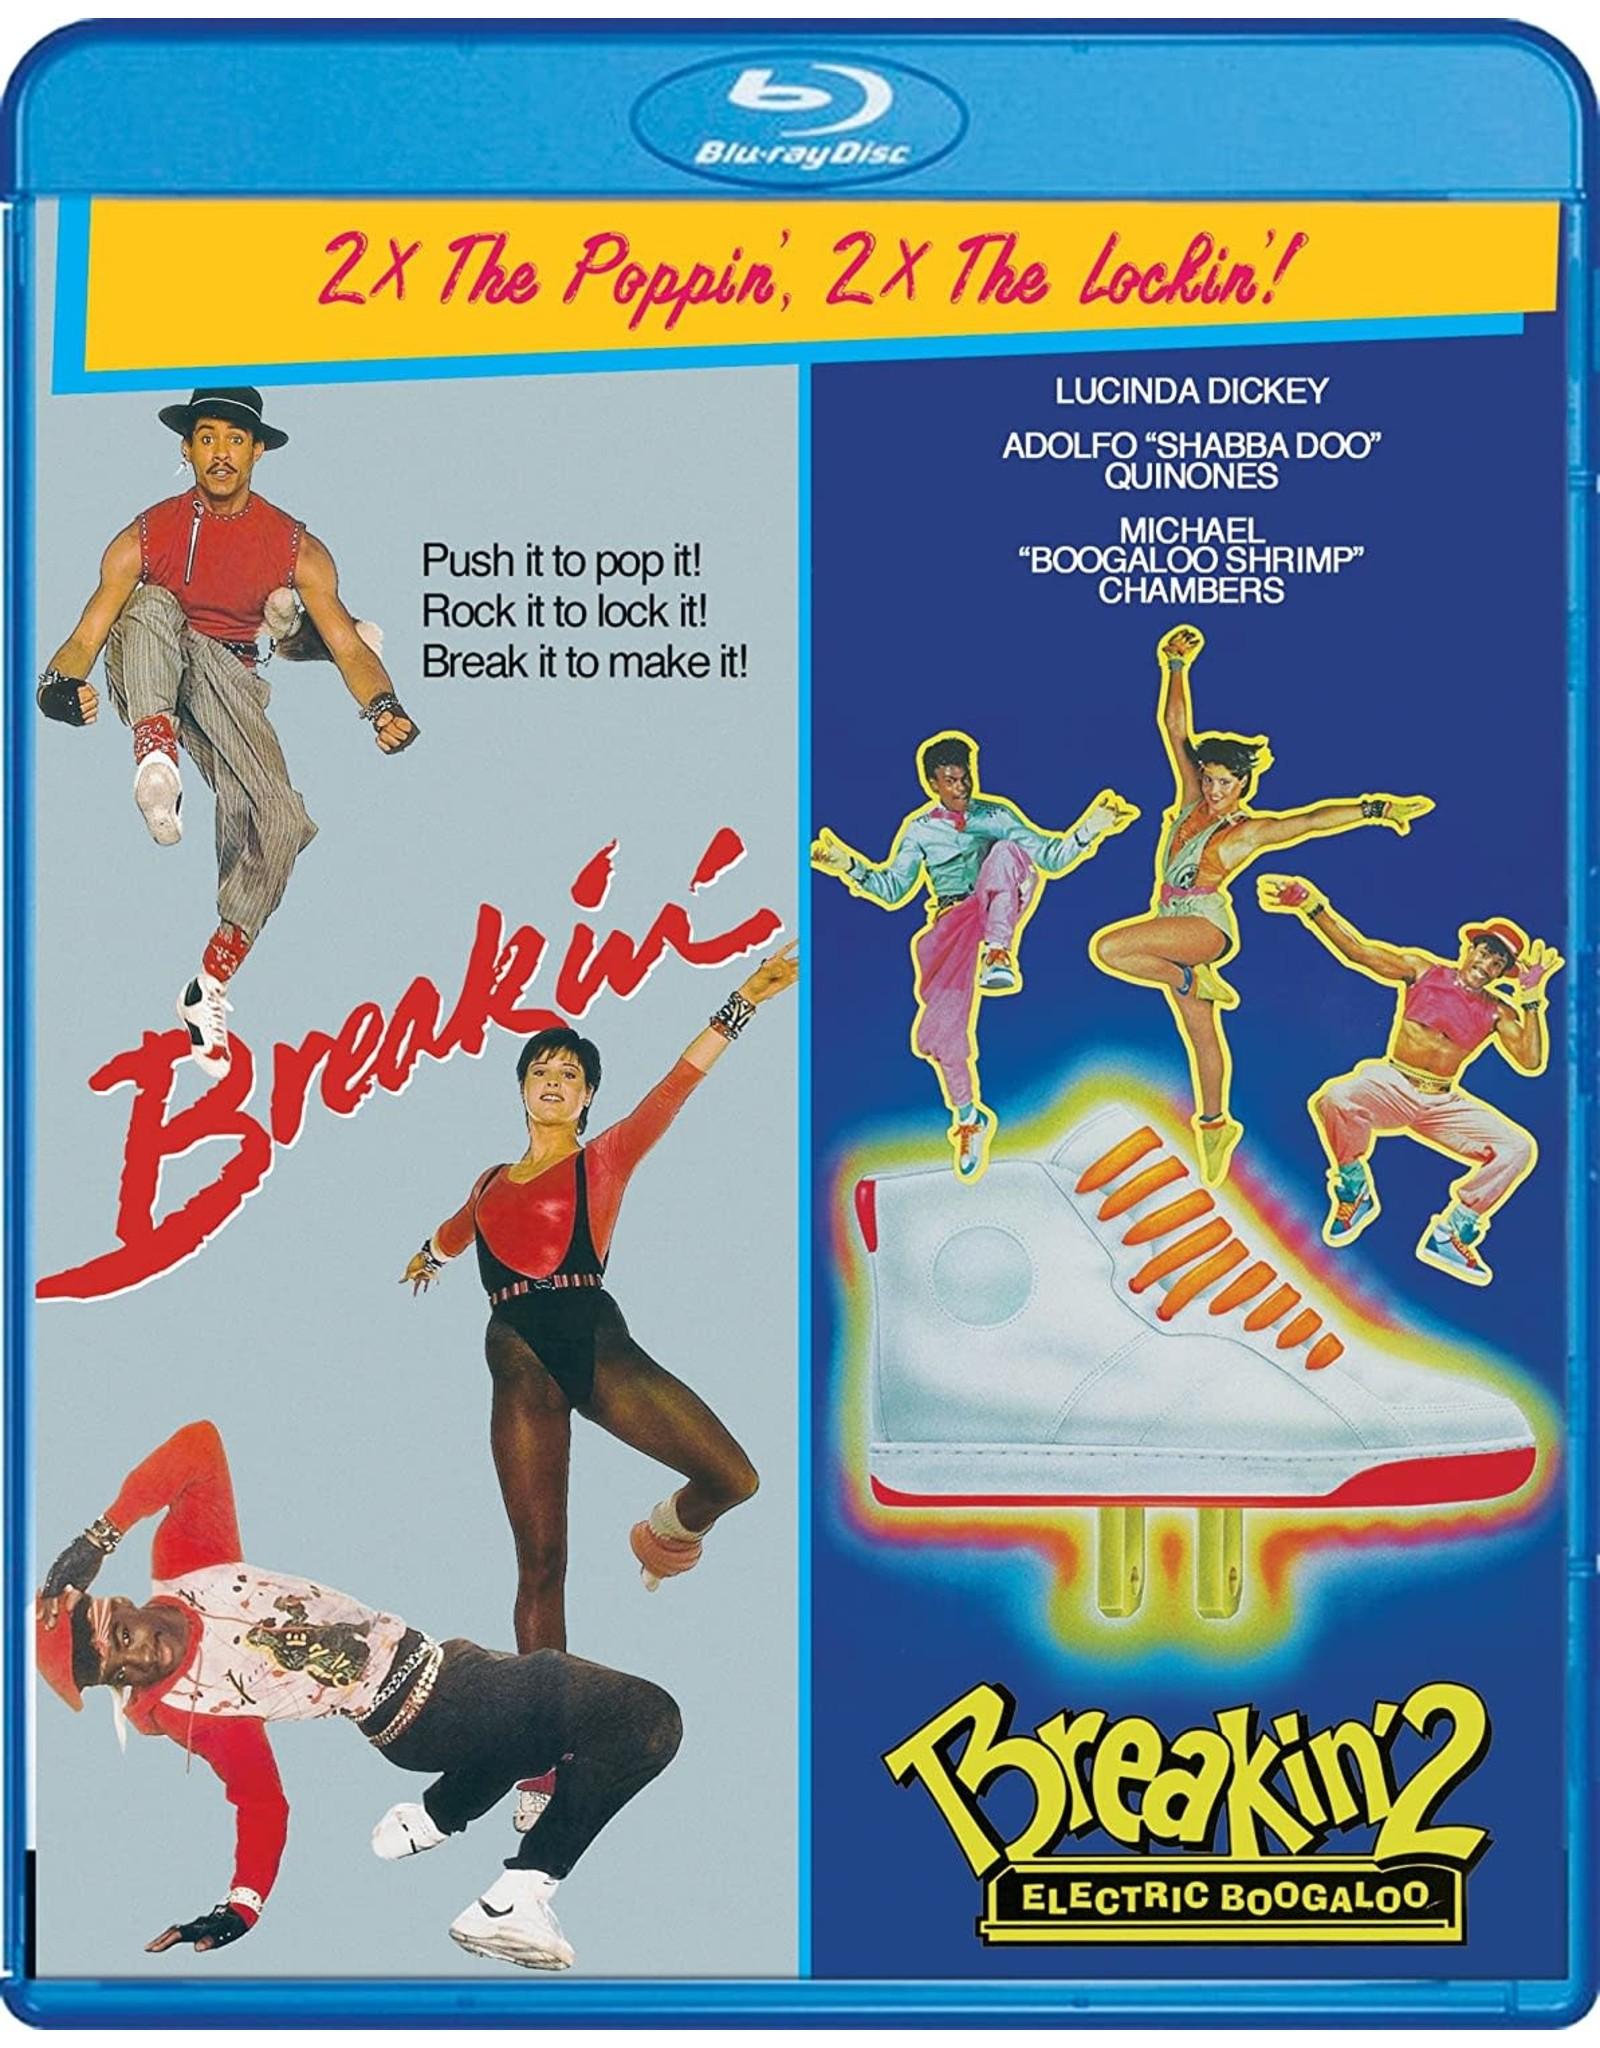 Cult and Cool Breakin' / Breakin' 2 Electric Boogaloo